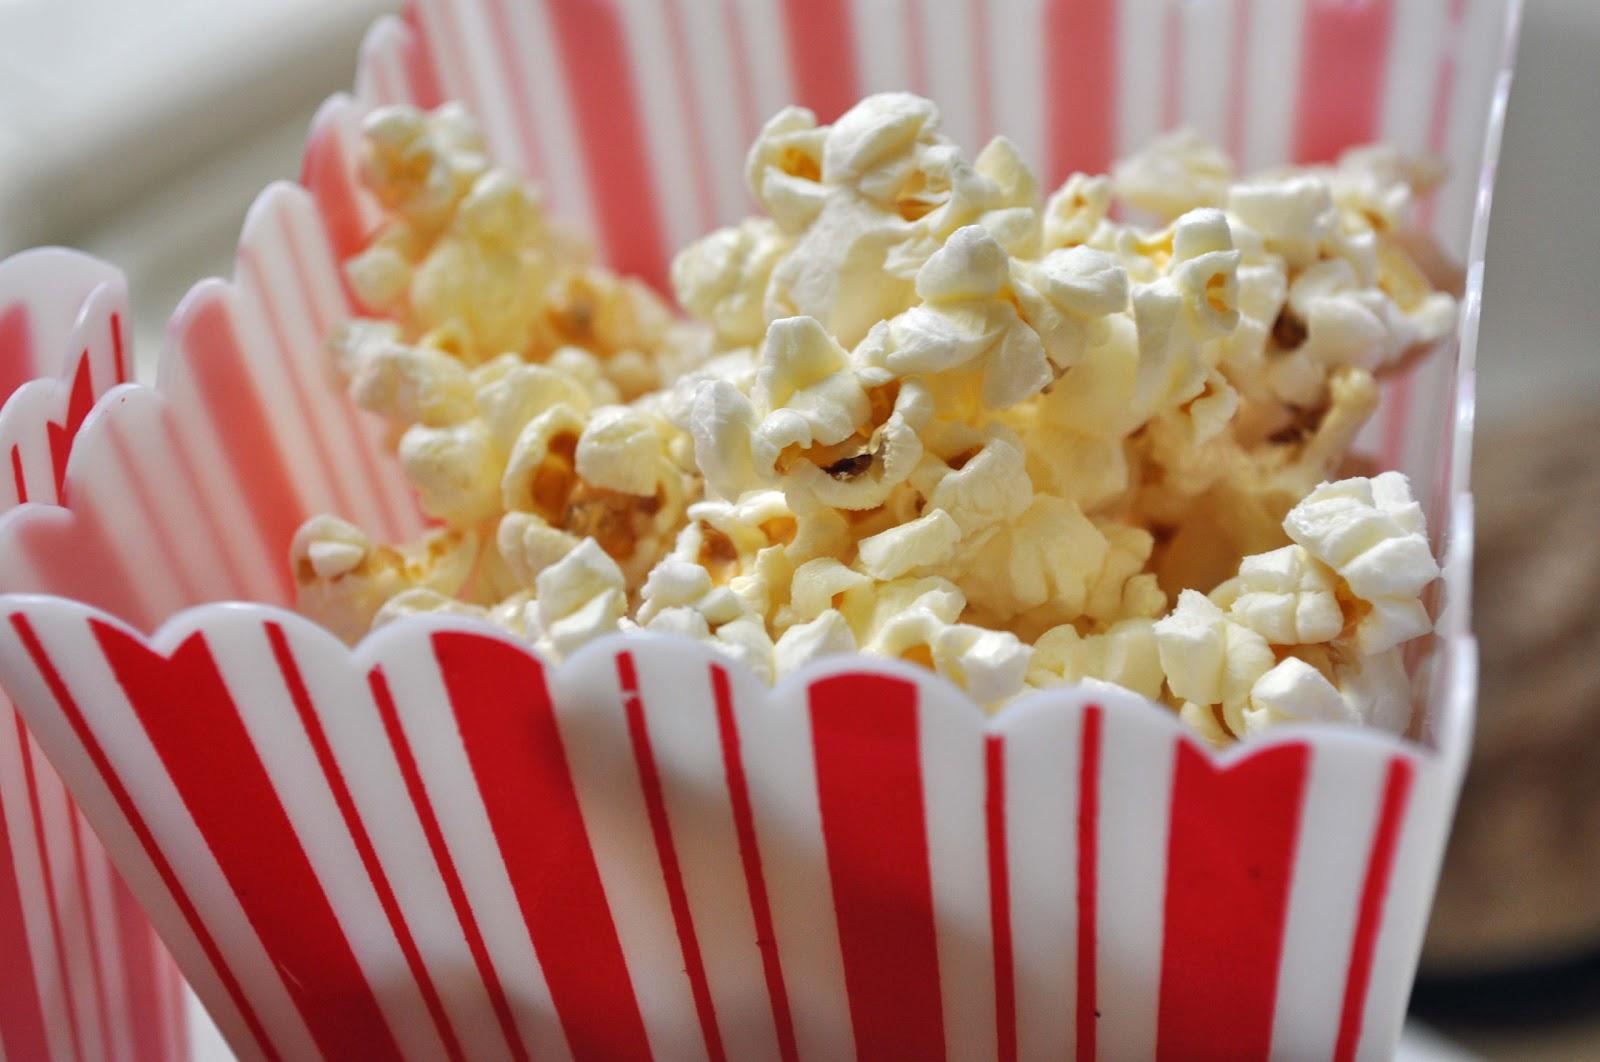 of popcorn